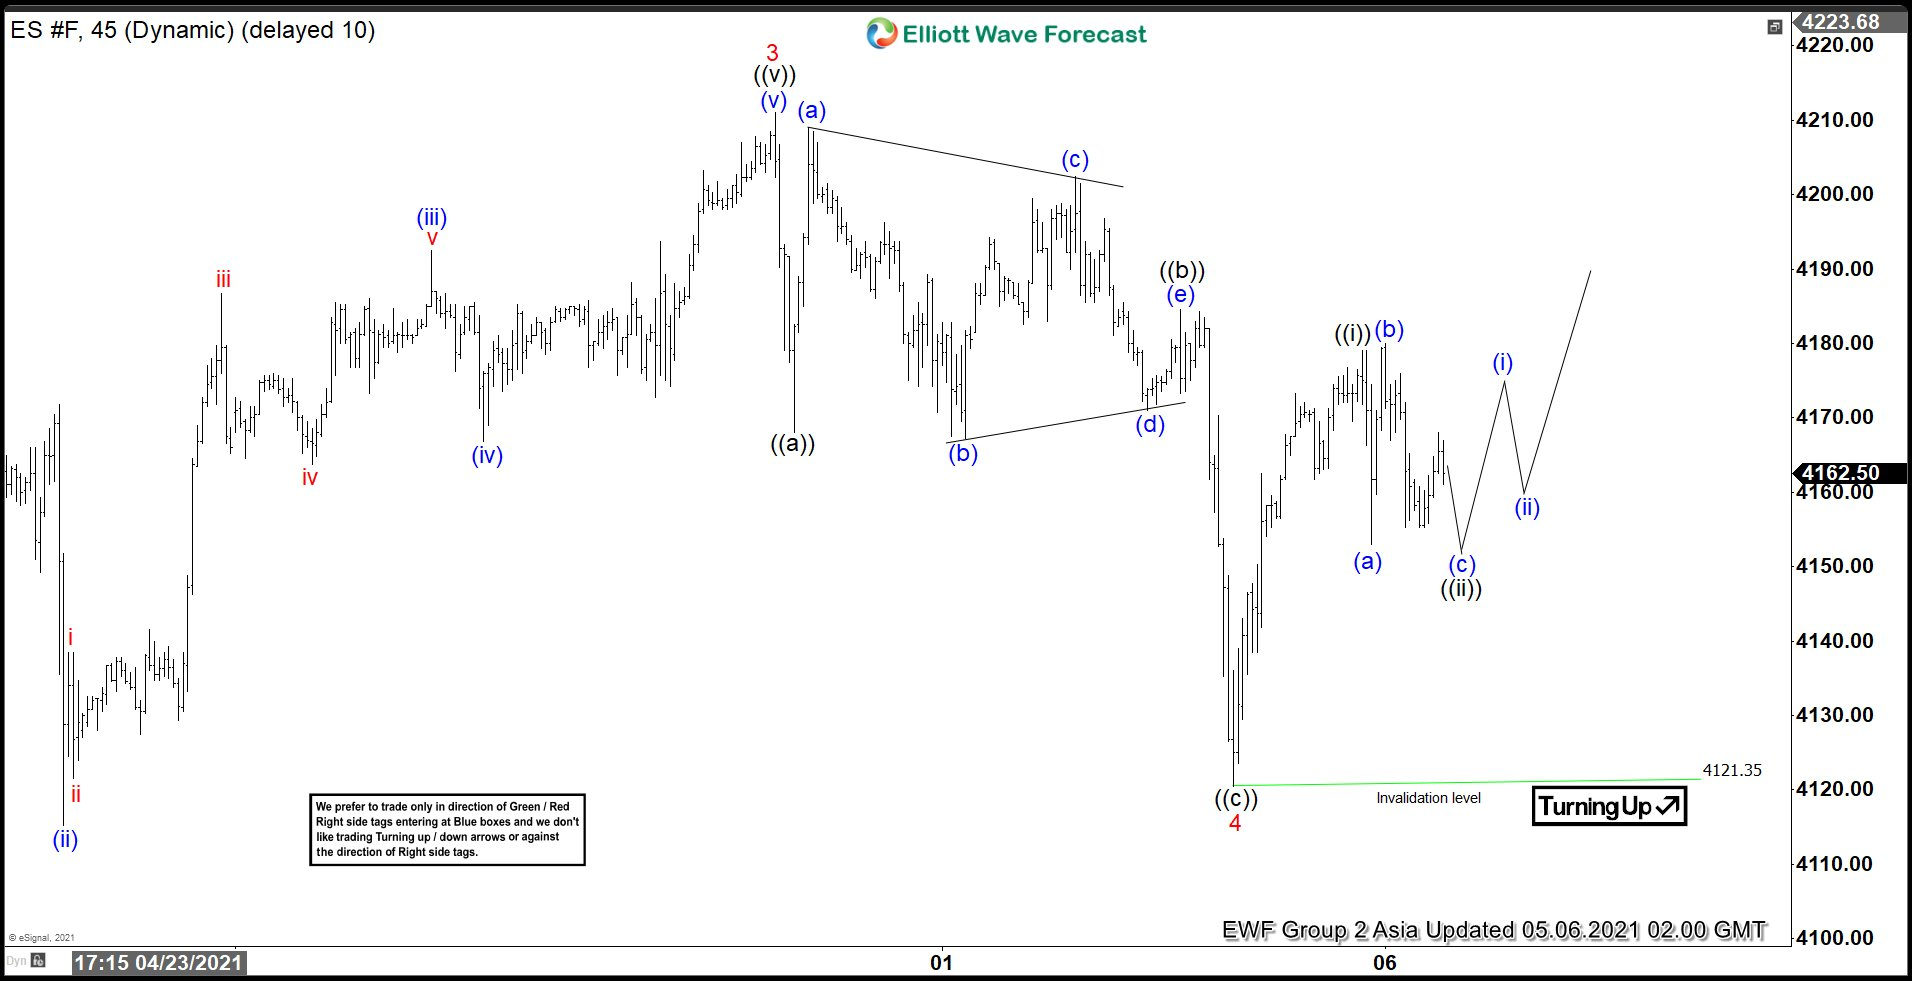 Elliott Wave View: S&P 500 E-Mini Futures (ES) Resumes Higher